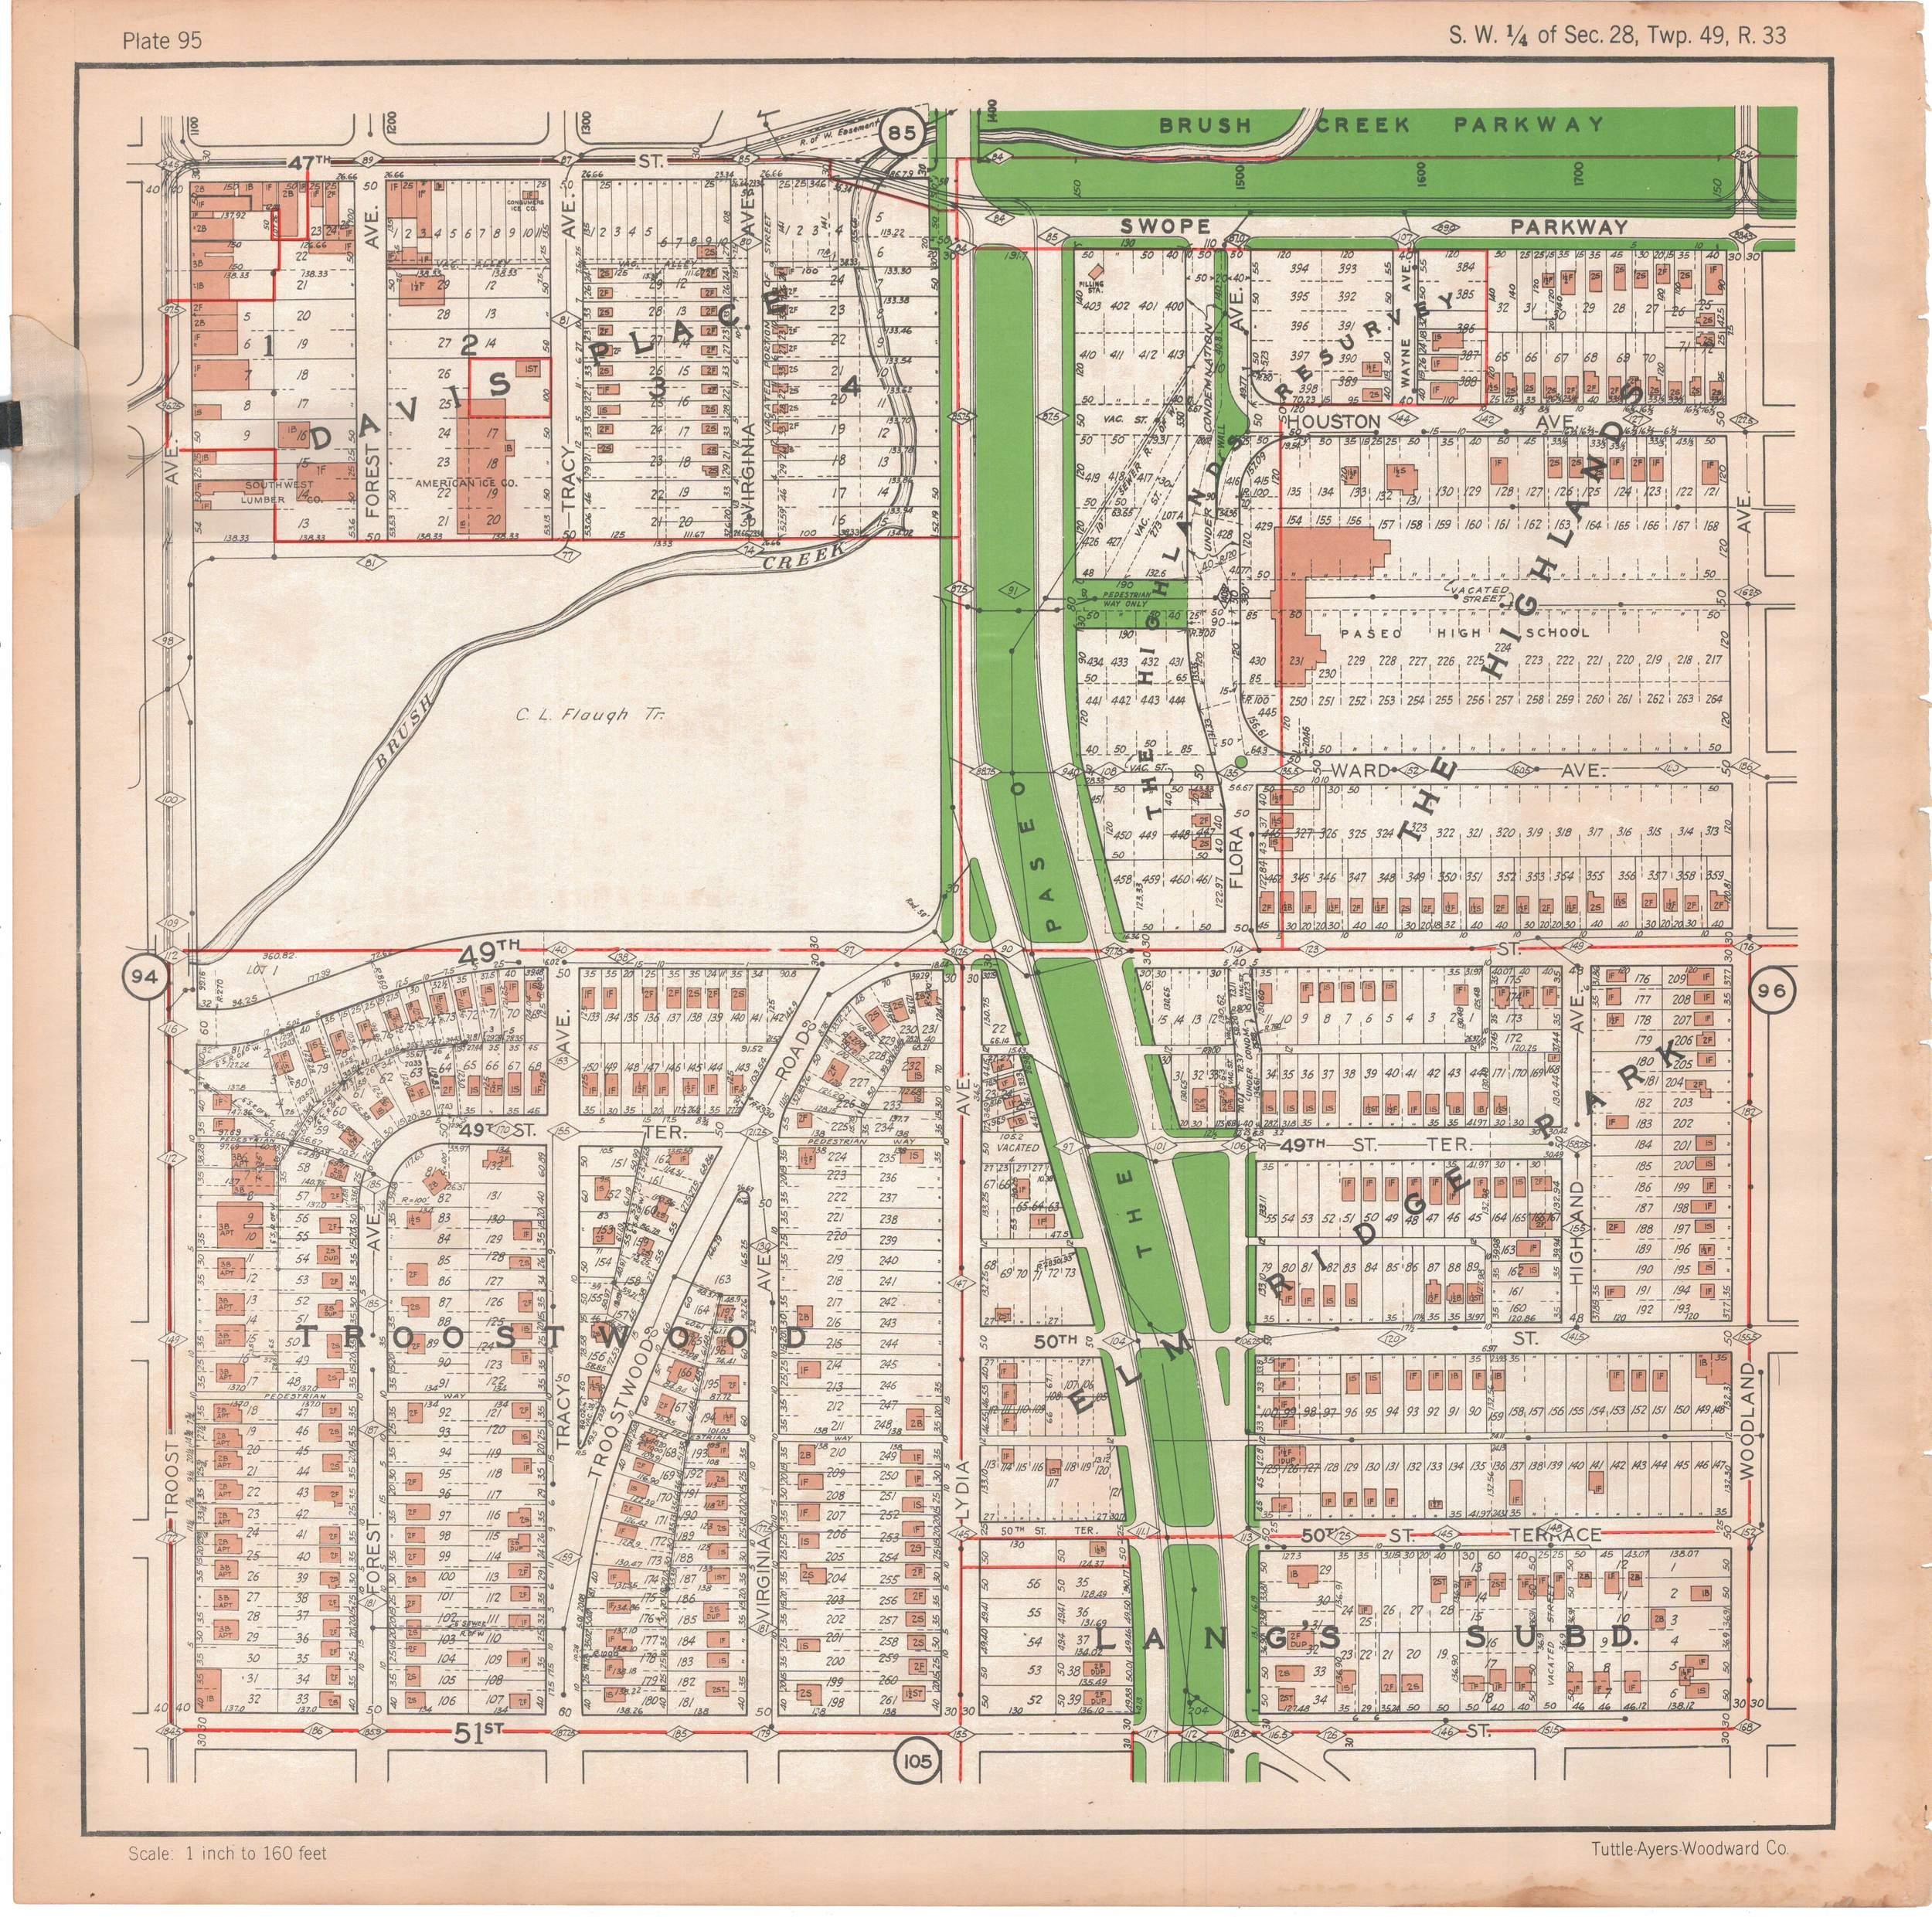 1925 TUTTLE_AYERS_Plate 95.JPG